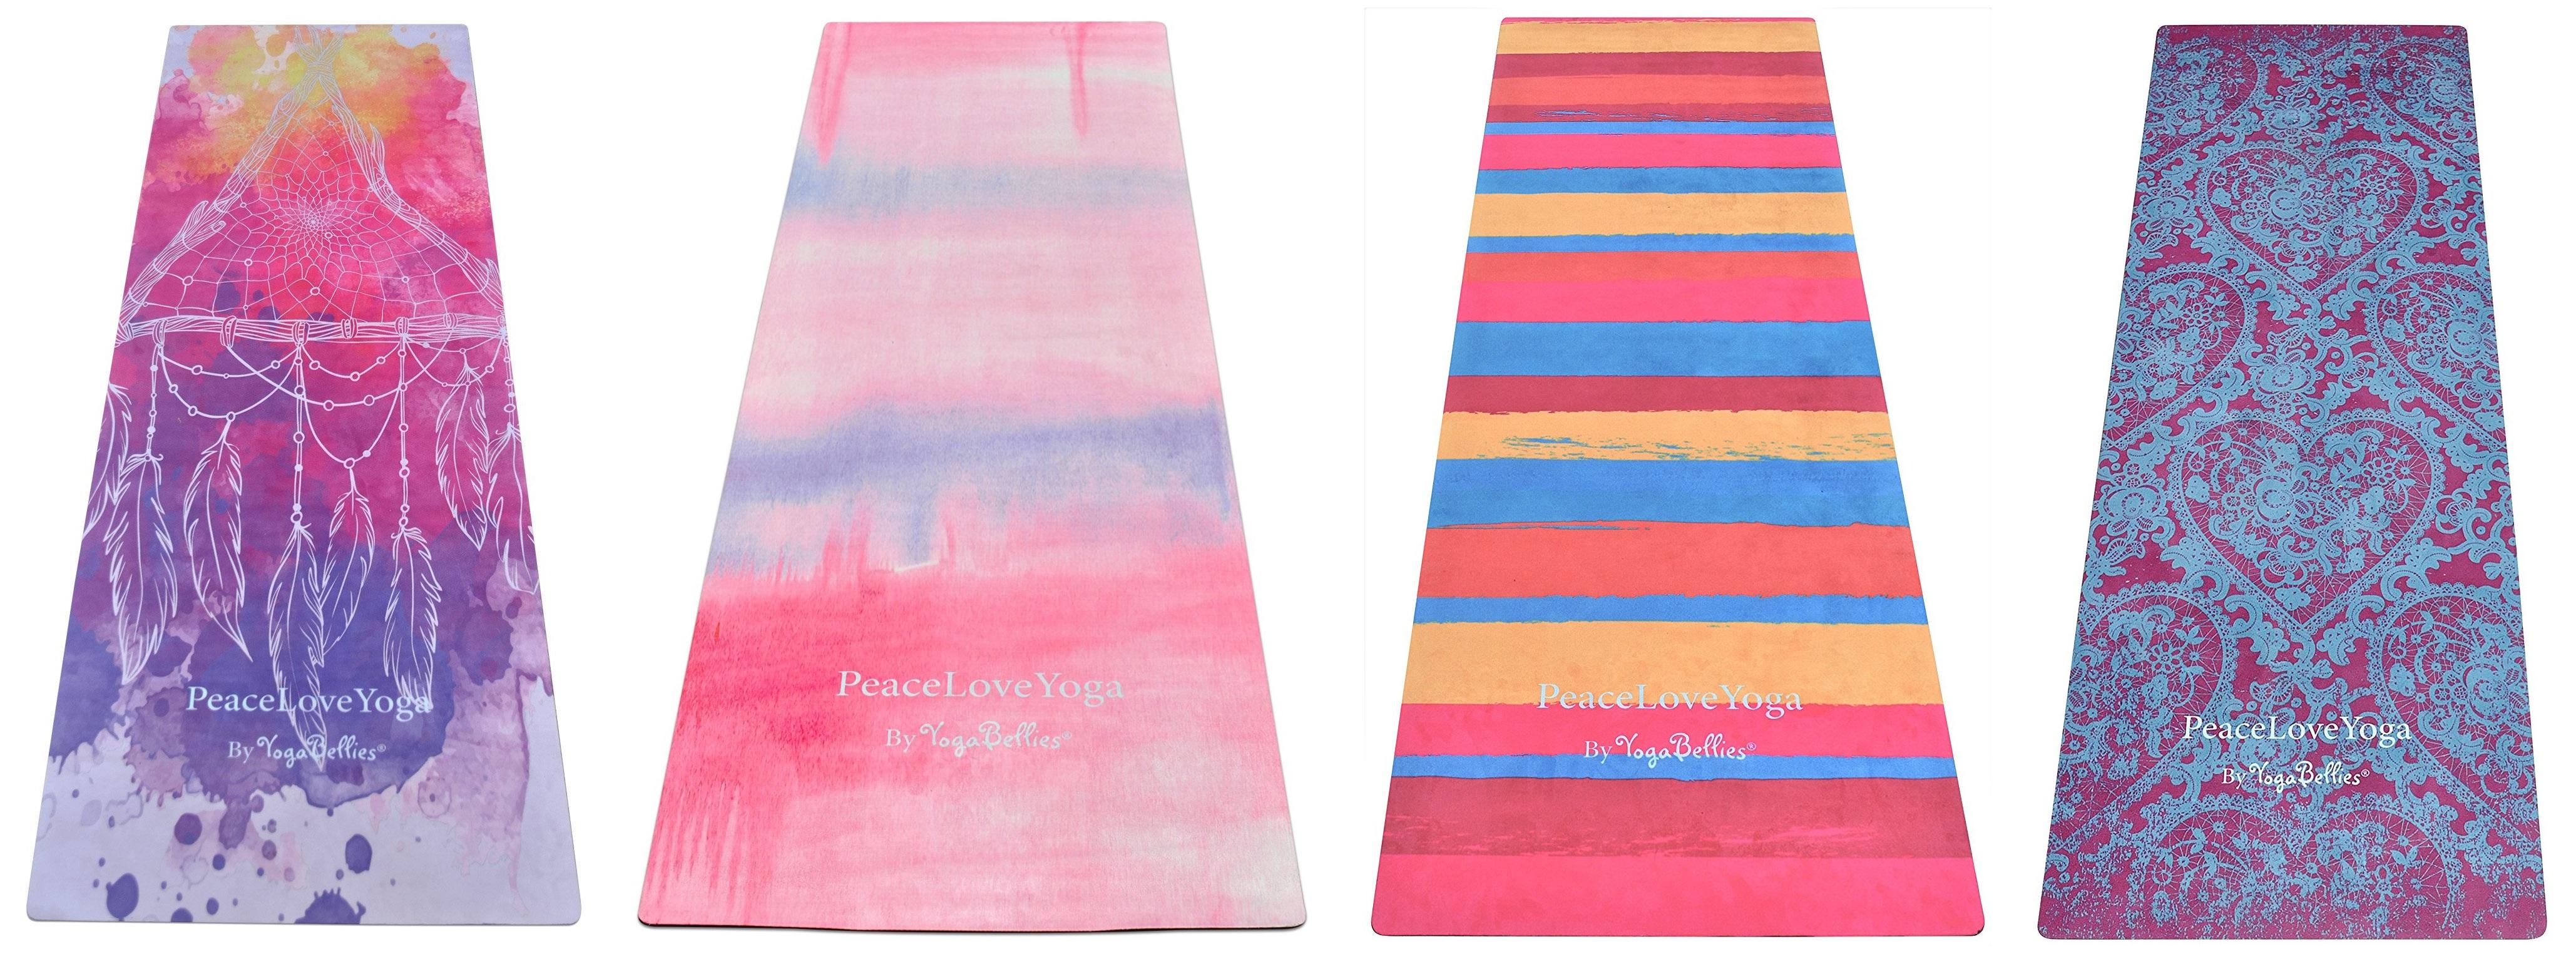 peaceloveyoga pretty yoga mat